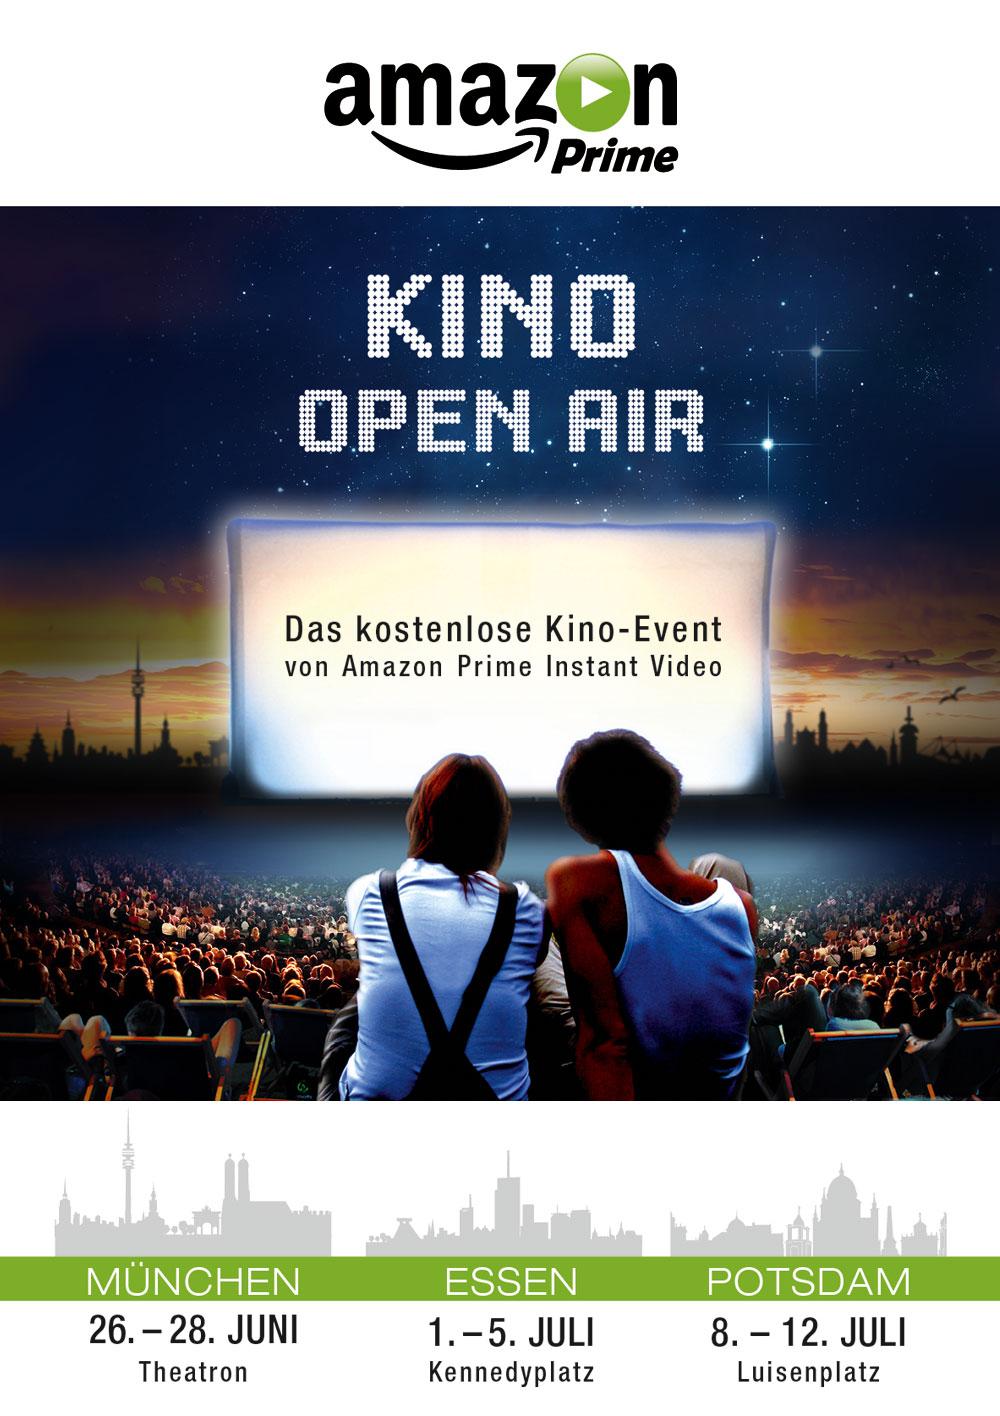 Amazon startet kostenlose Kino-Open-Air-Events